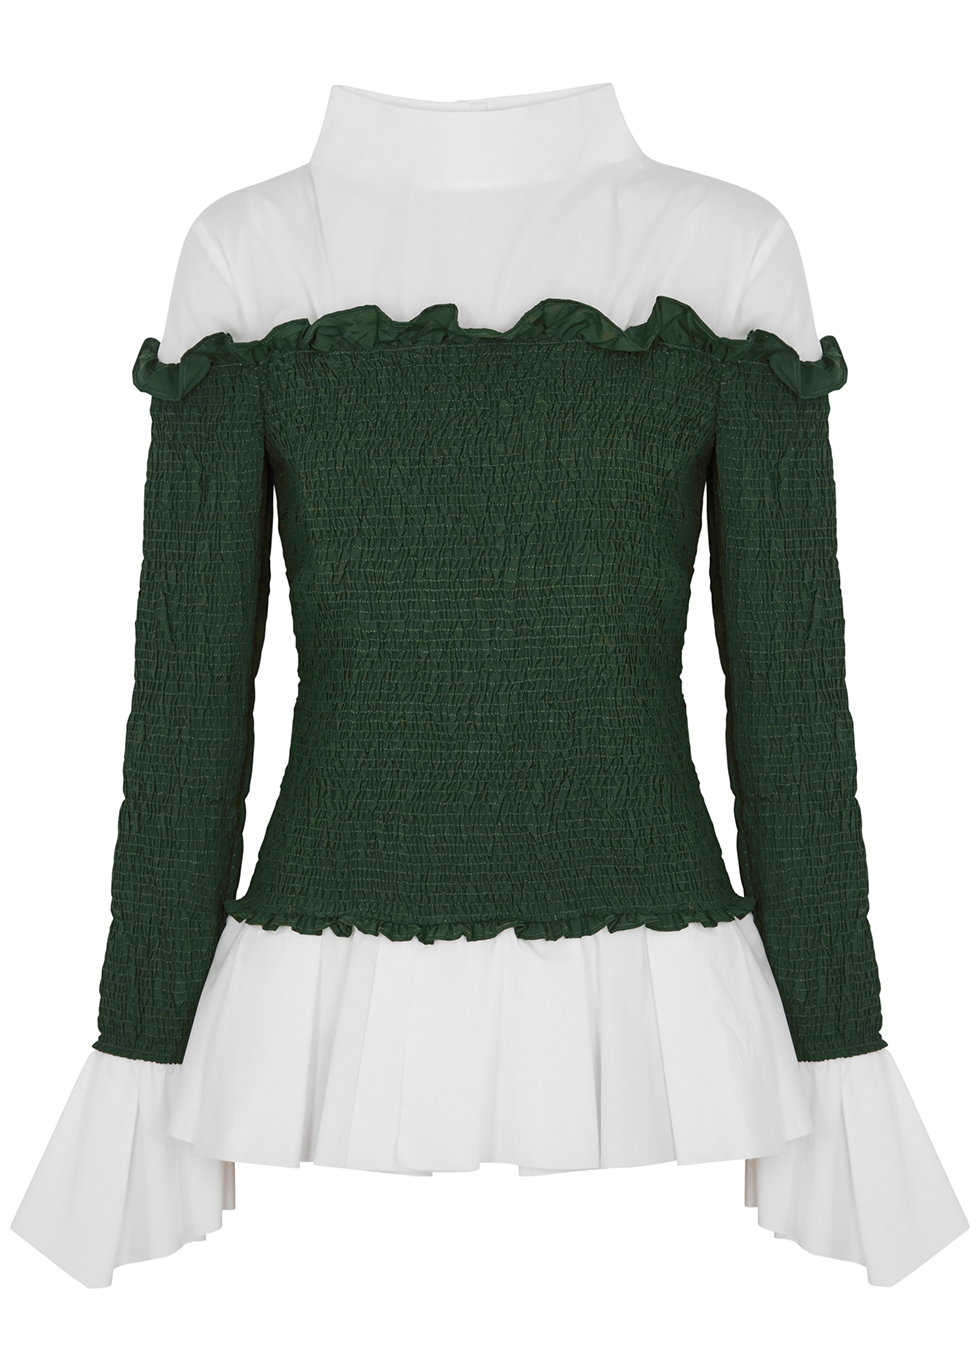 White and green smocked poplin shirt